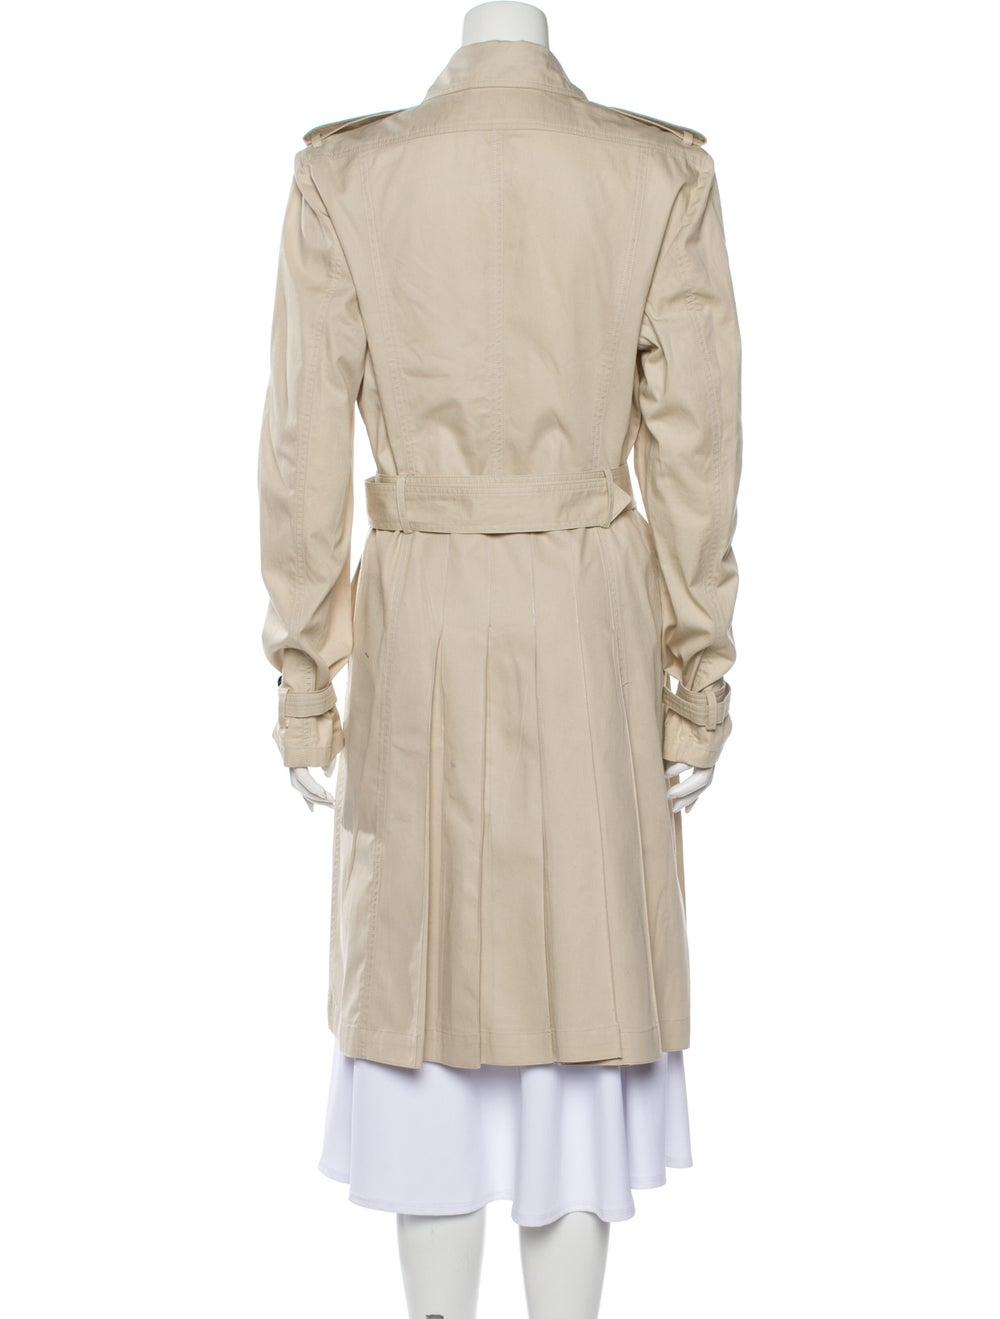 Burberry Trench Coat - image 3